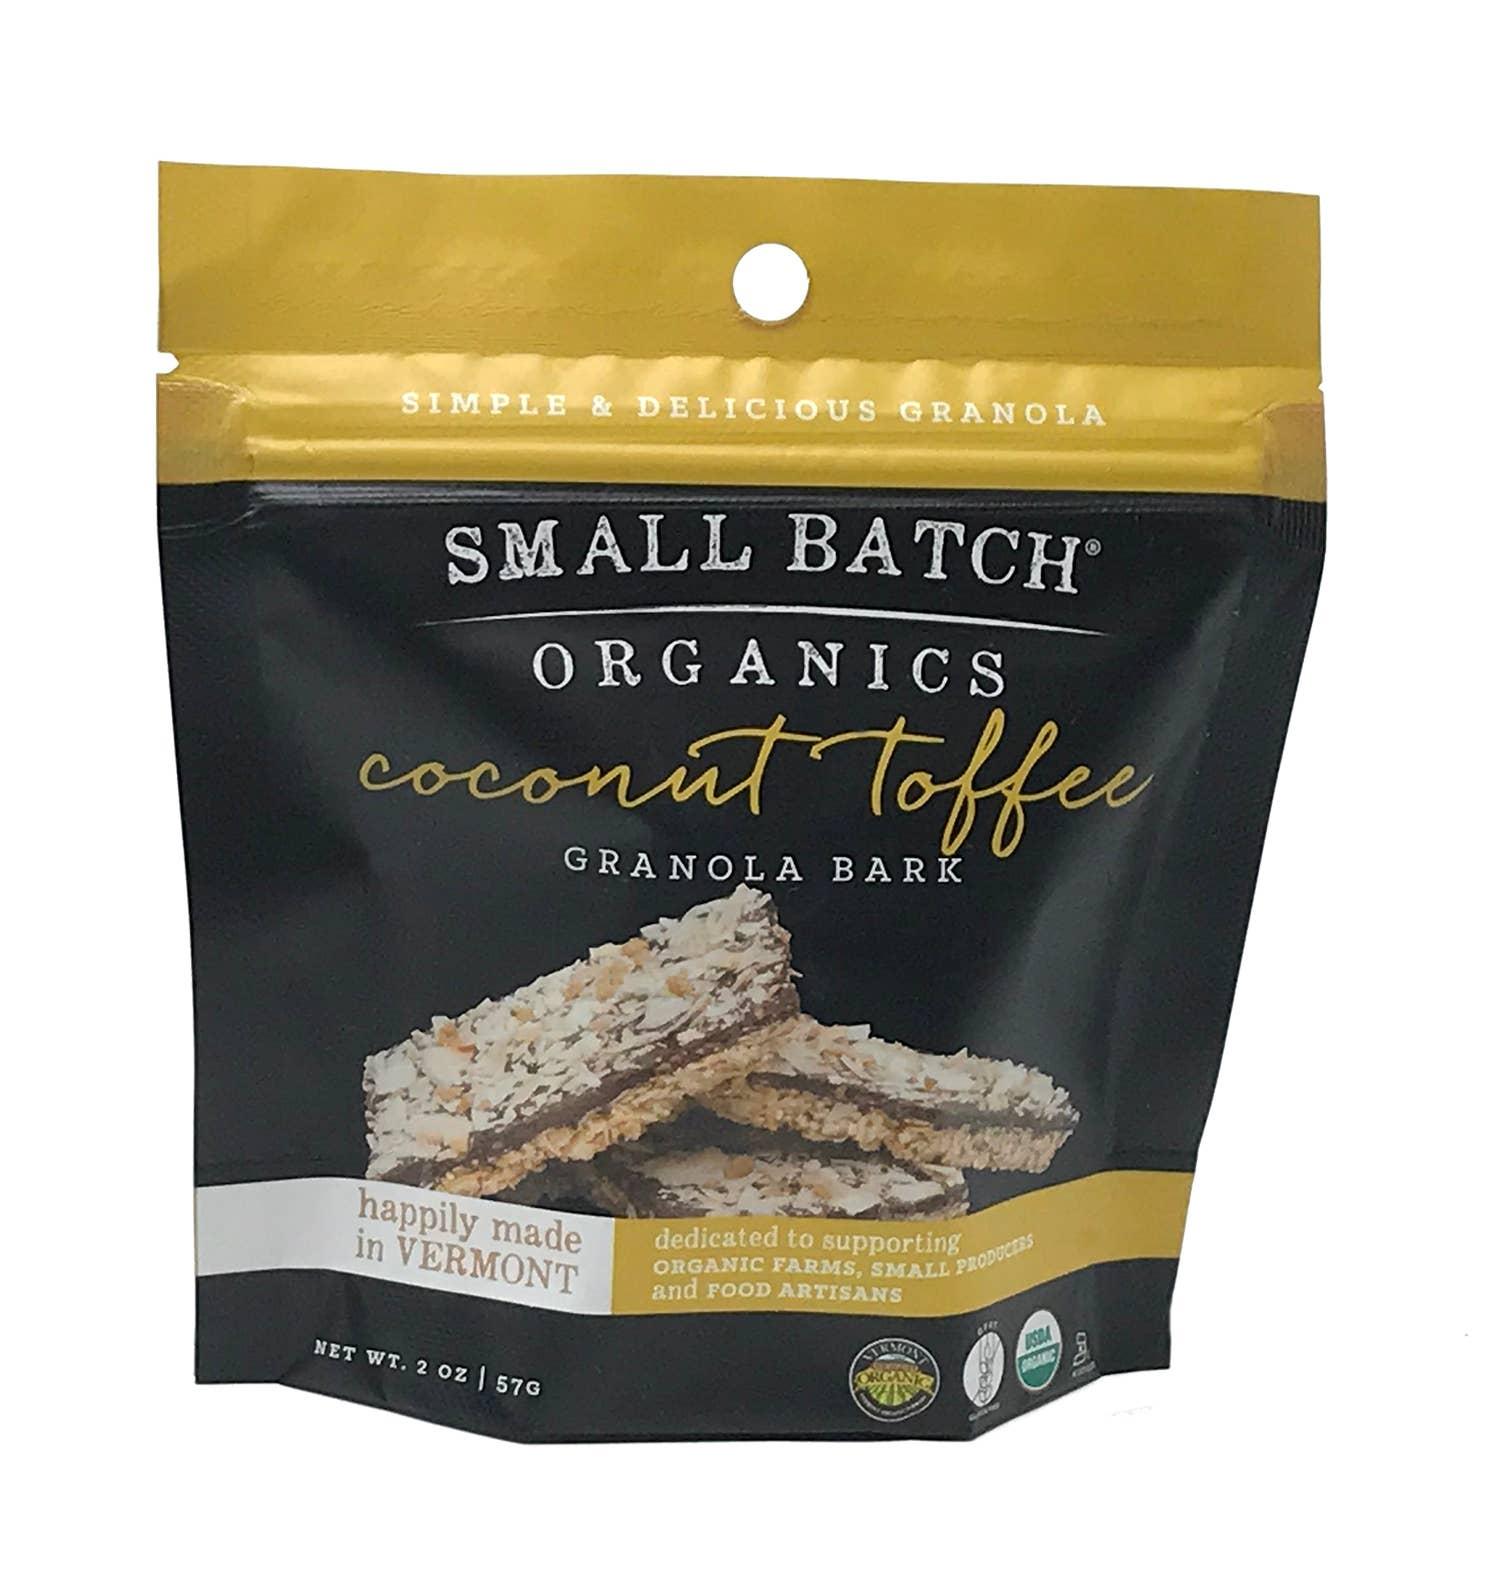 2oz Coconut Toffee Granola Bark | Trada Marketplace